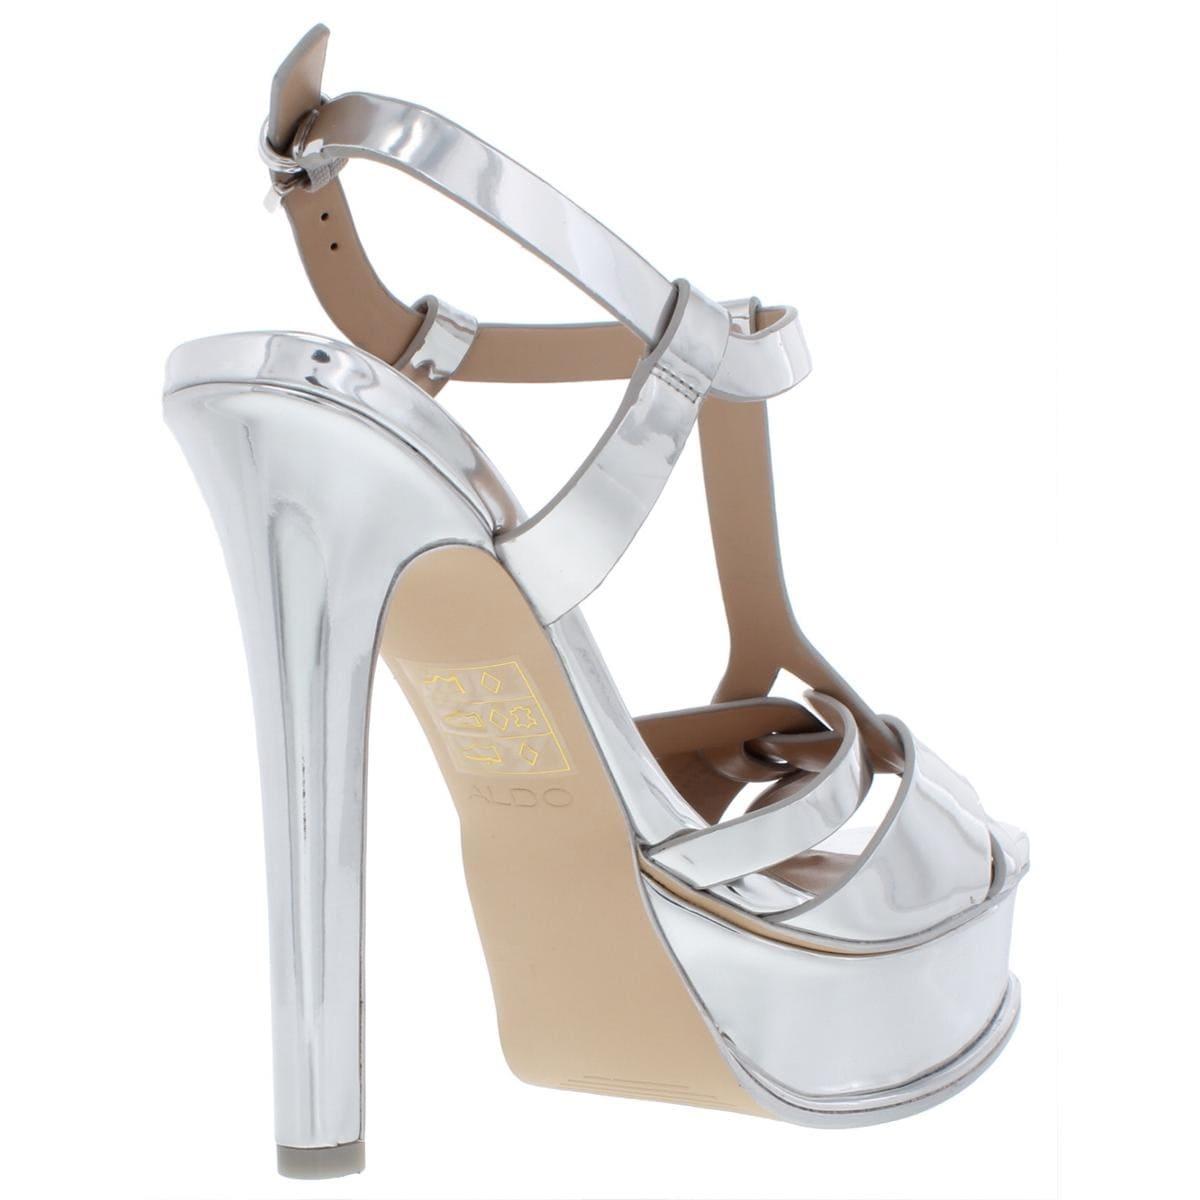 38ef881da5d5 Shop Aldo Womens Chelly Platform Sandals Evening - Free Shipping Today -  Overstock - 27728764